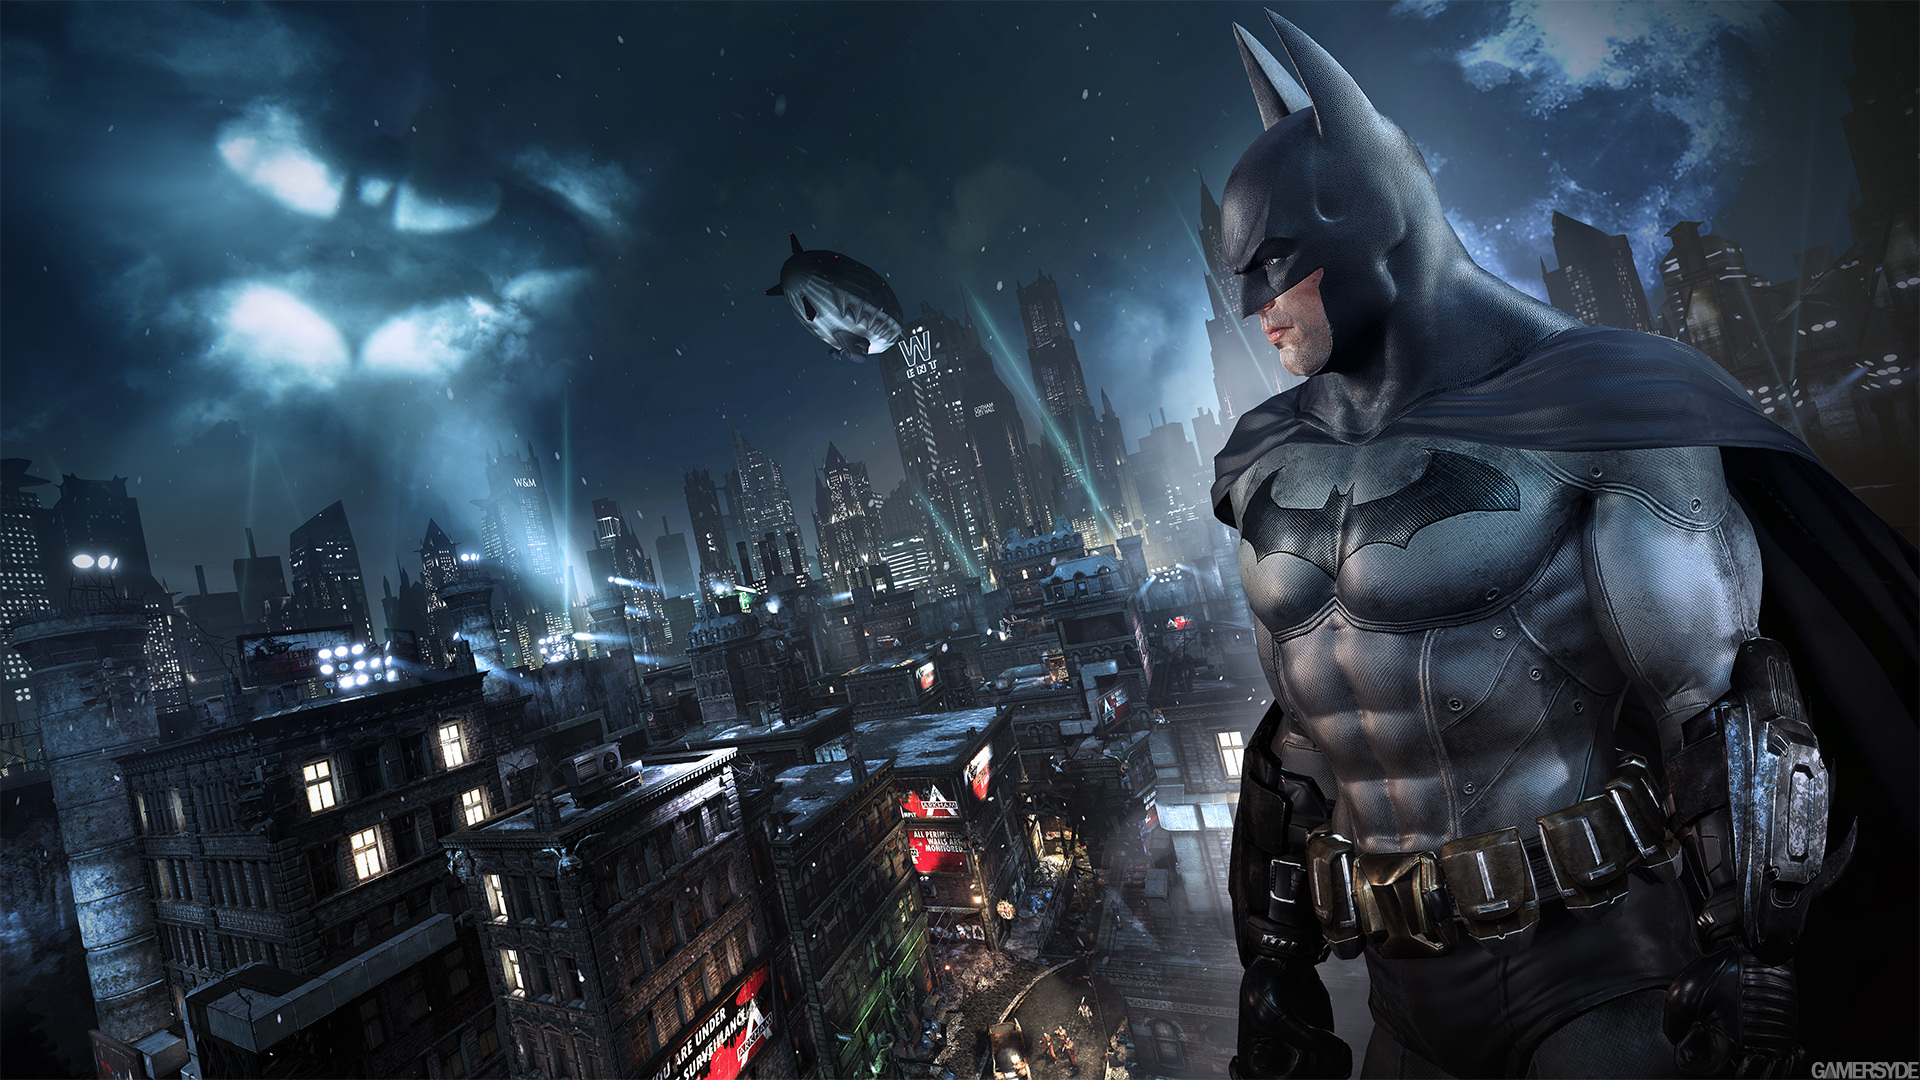 image_batman_return_to_arkham-31783-3591_0001